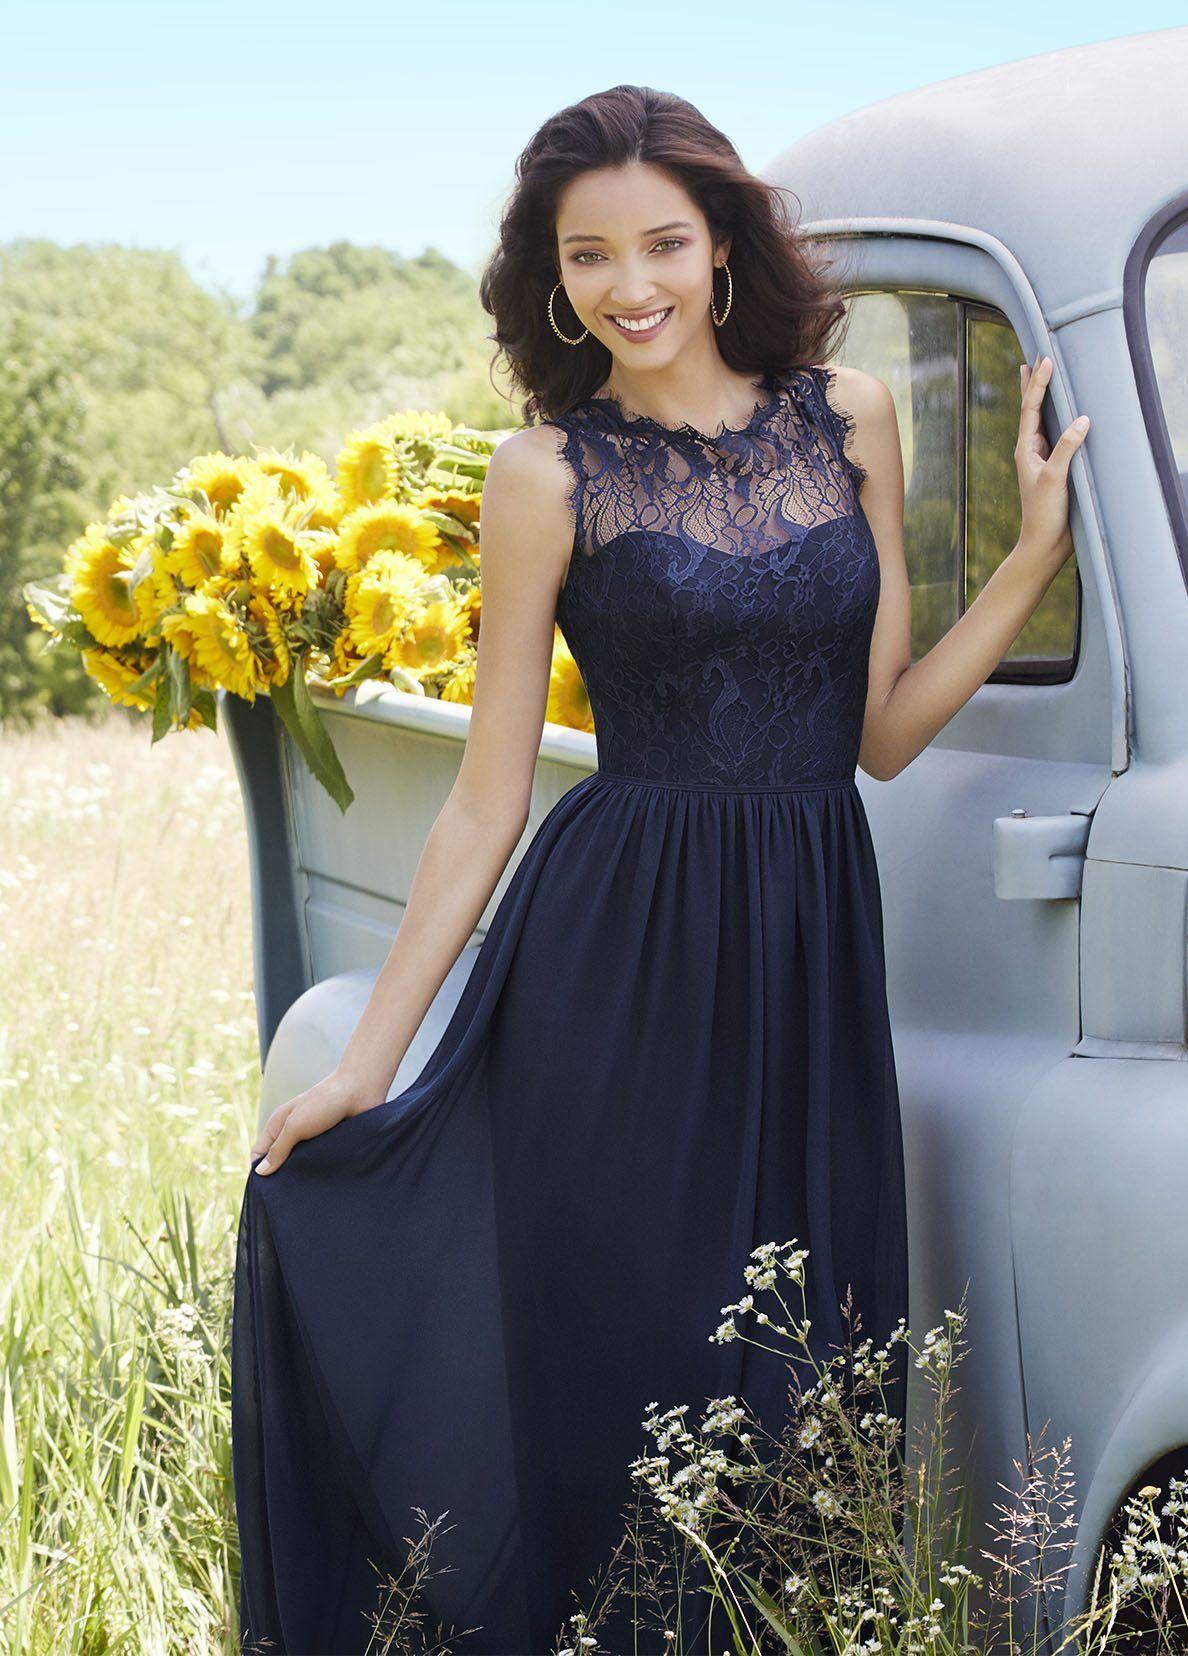 Indigo chiffon aline bridesmaid gown navy lace bateau neckline